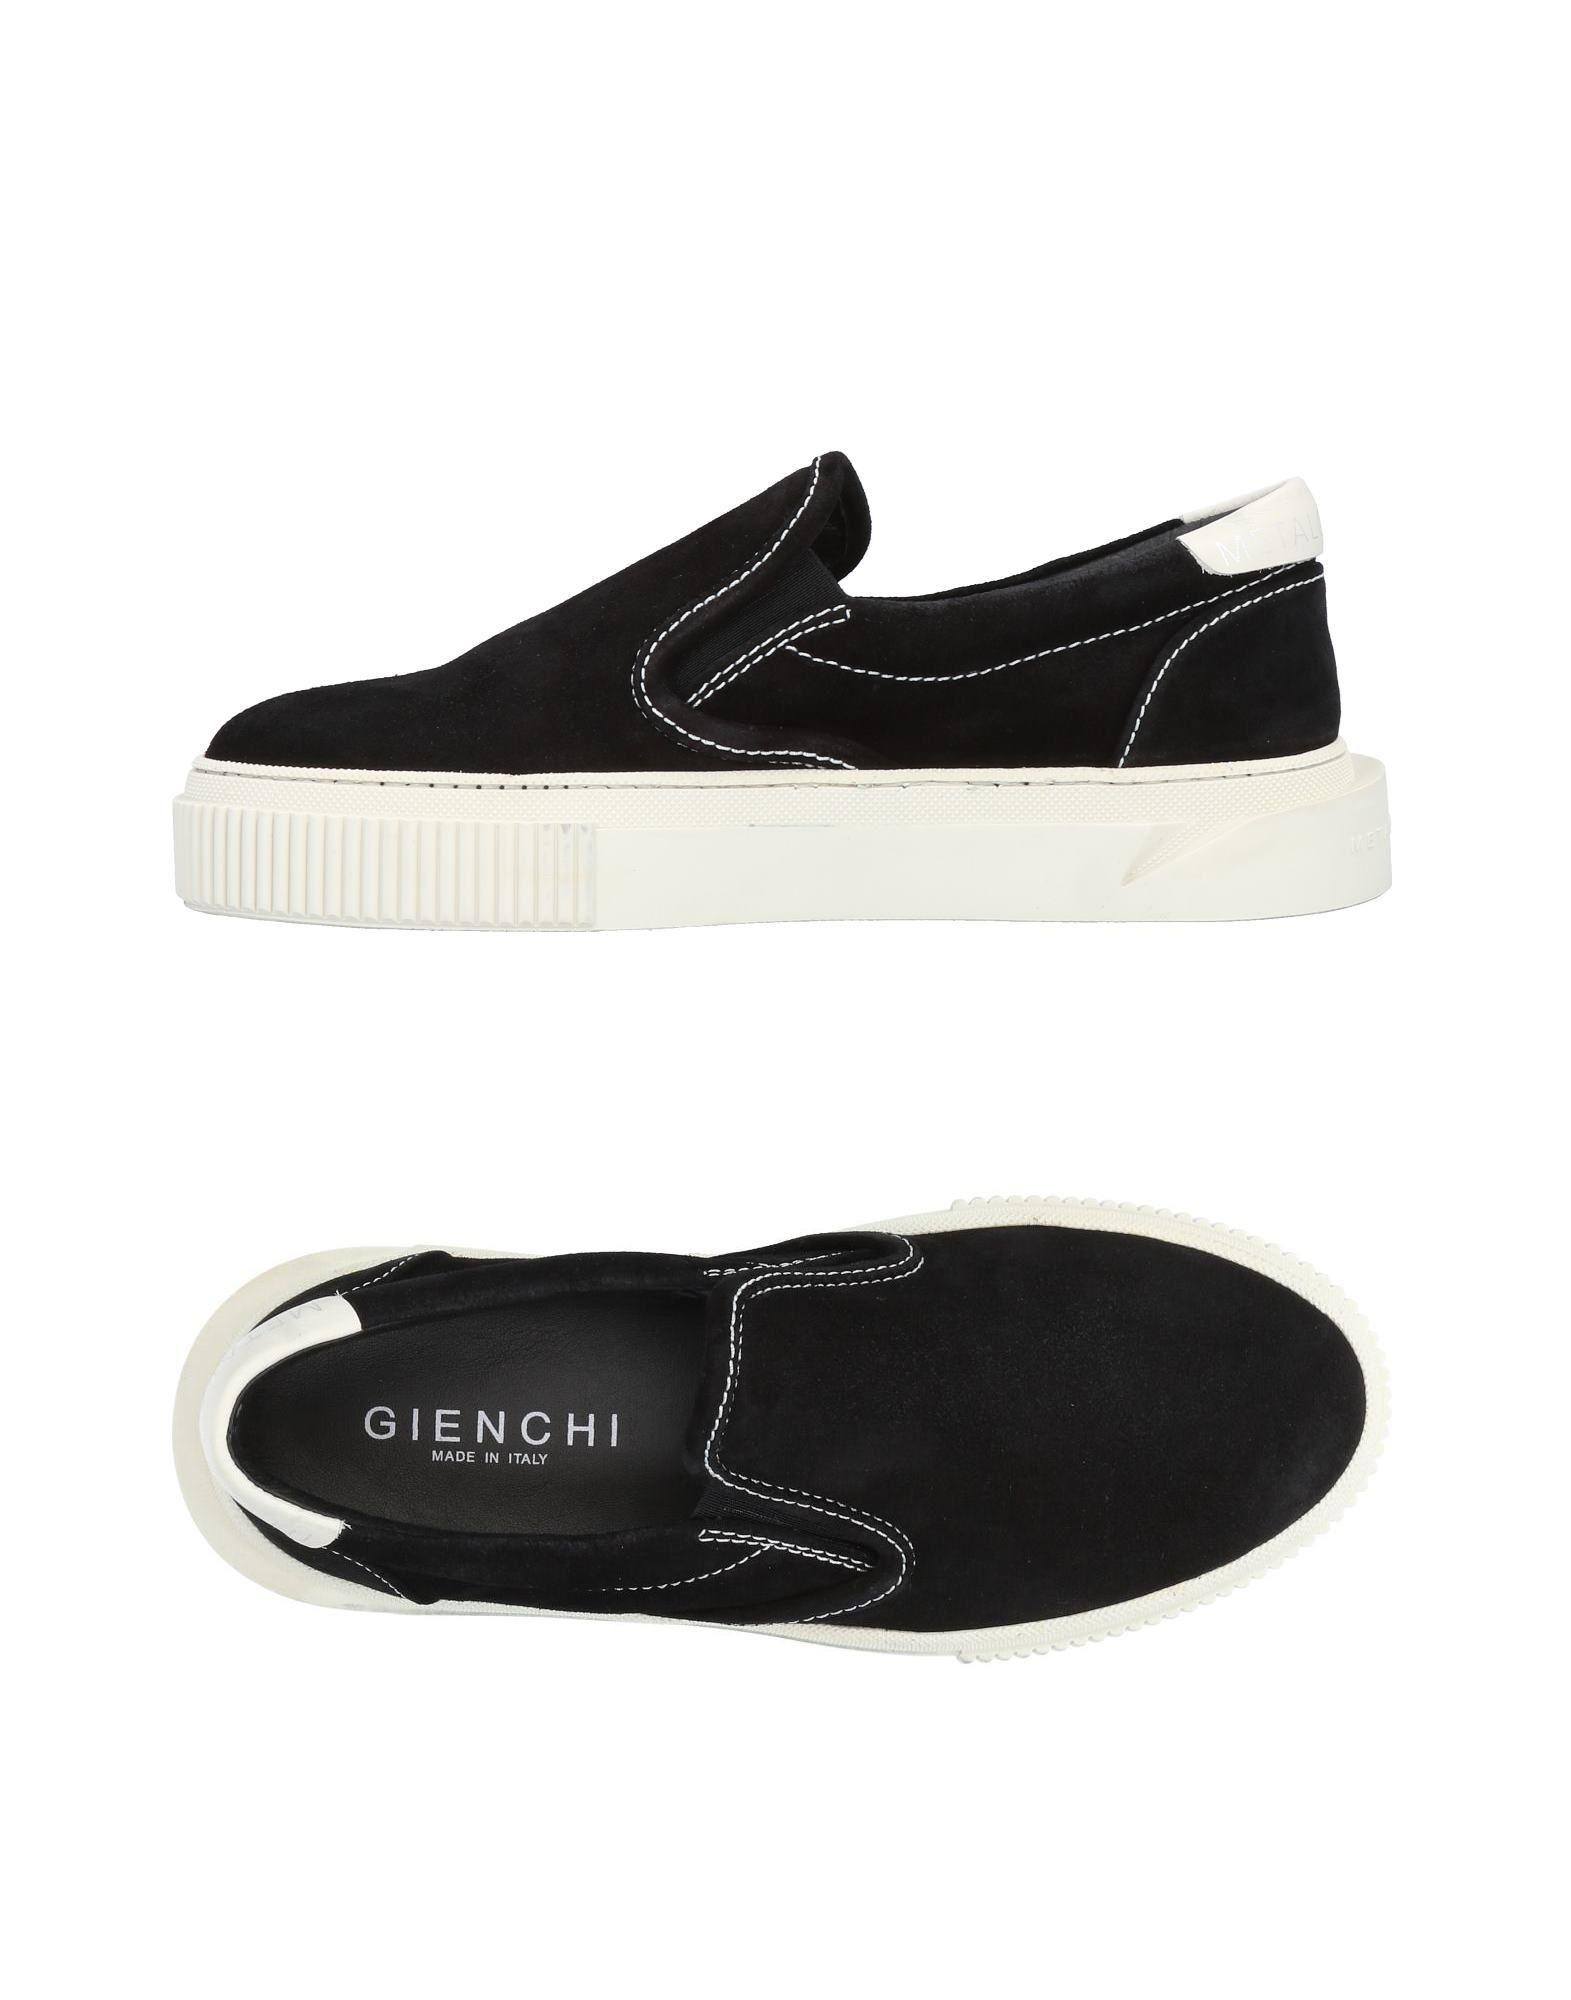 Moda Sneakers Metalgienchi Donna - 11486046LG